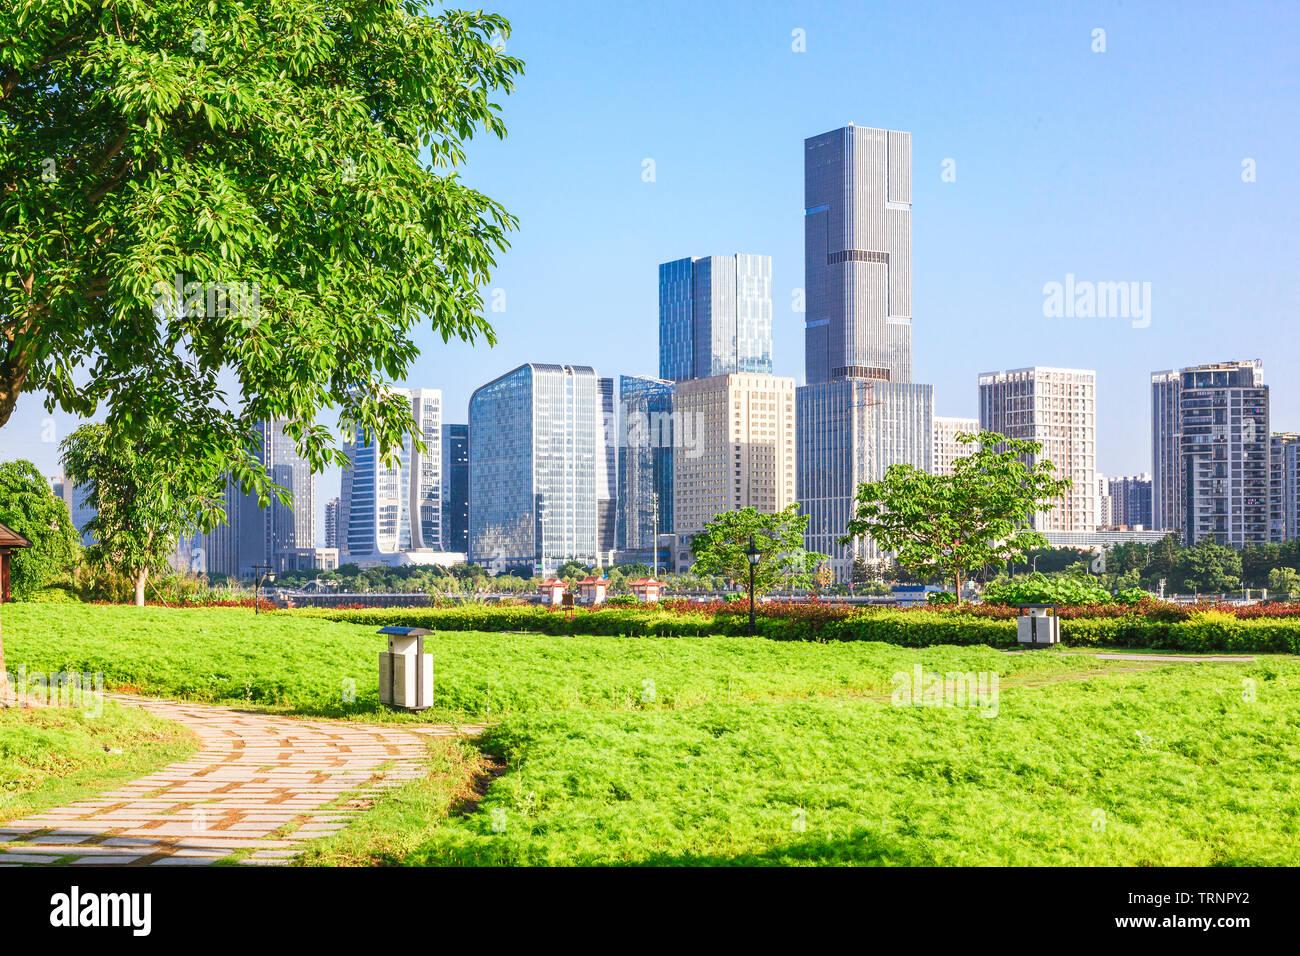 Cityscape and skyline of Fuzhou from green field in park,Fuzhou,China - Stock Image